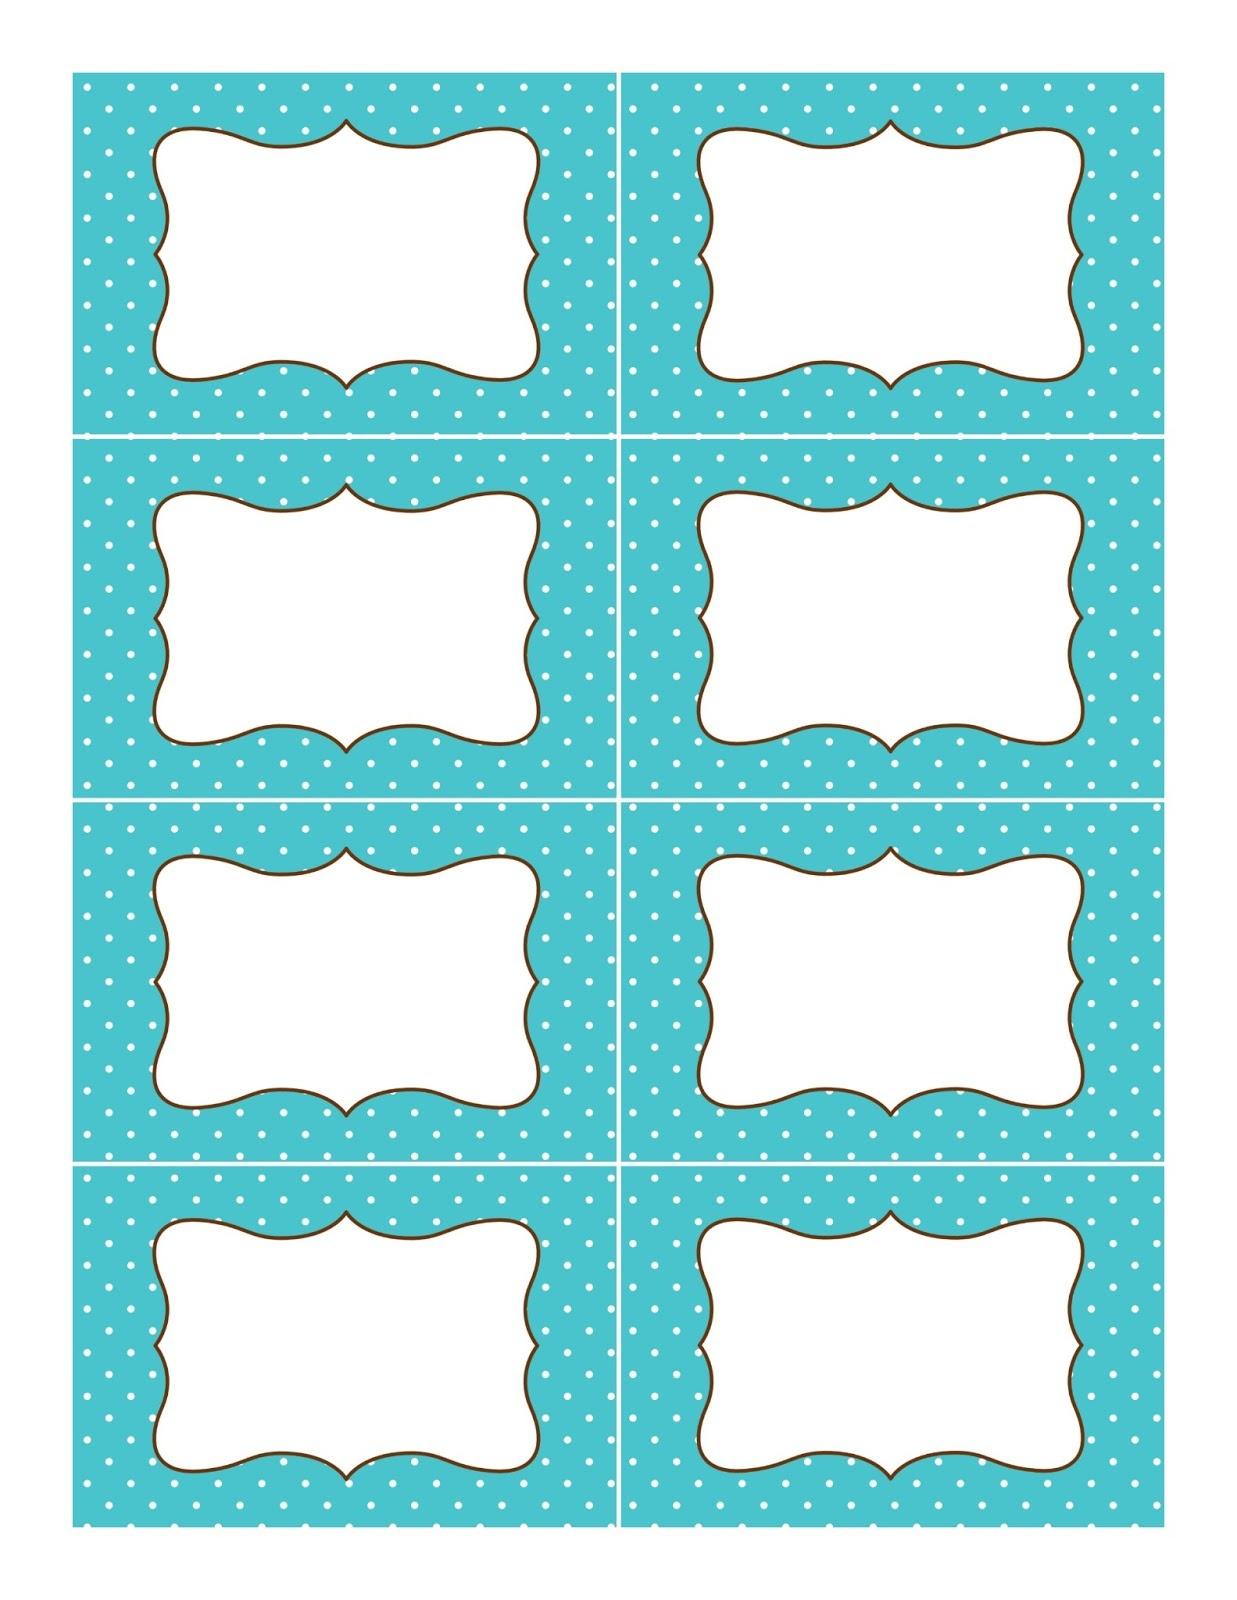 Pincrystal Long On Sweet Bar Buffet | Printable Labels, Candy - Free Editable Printable Labels